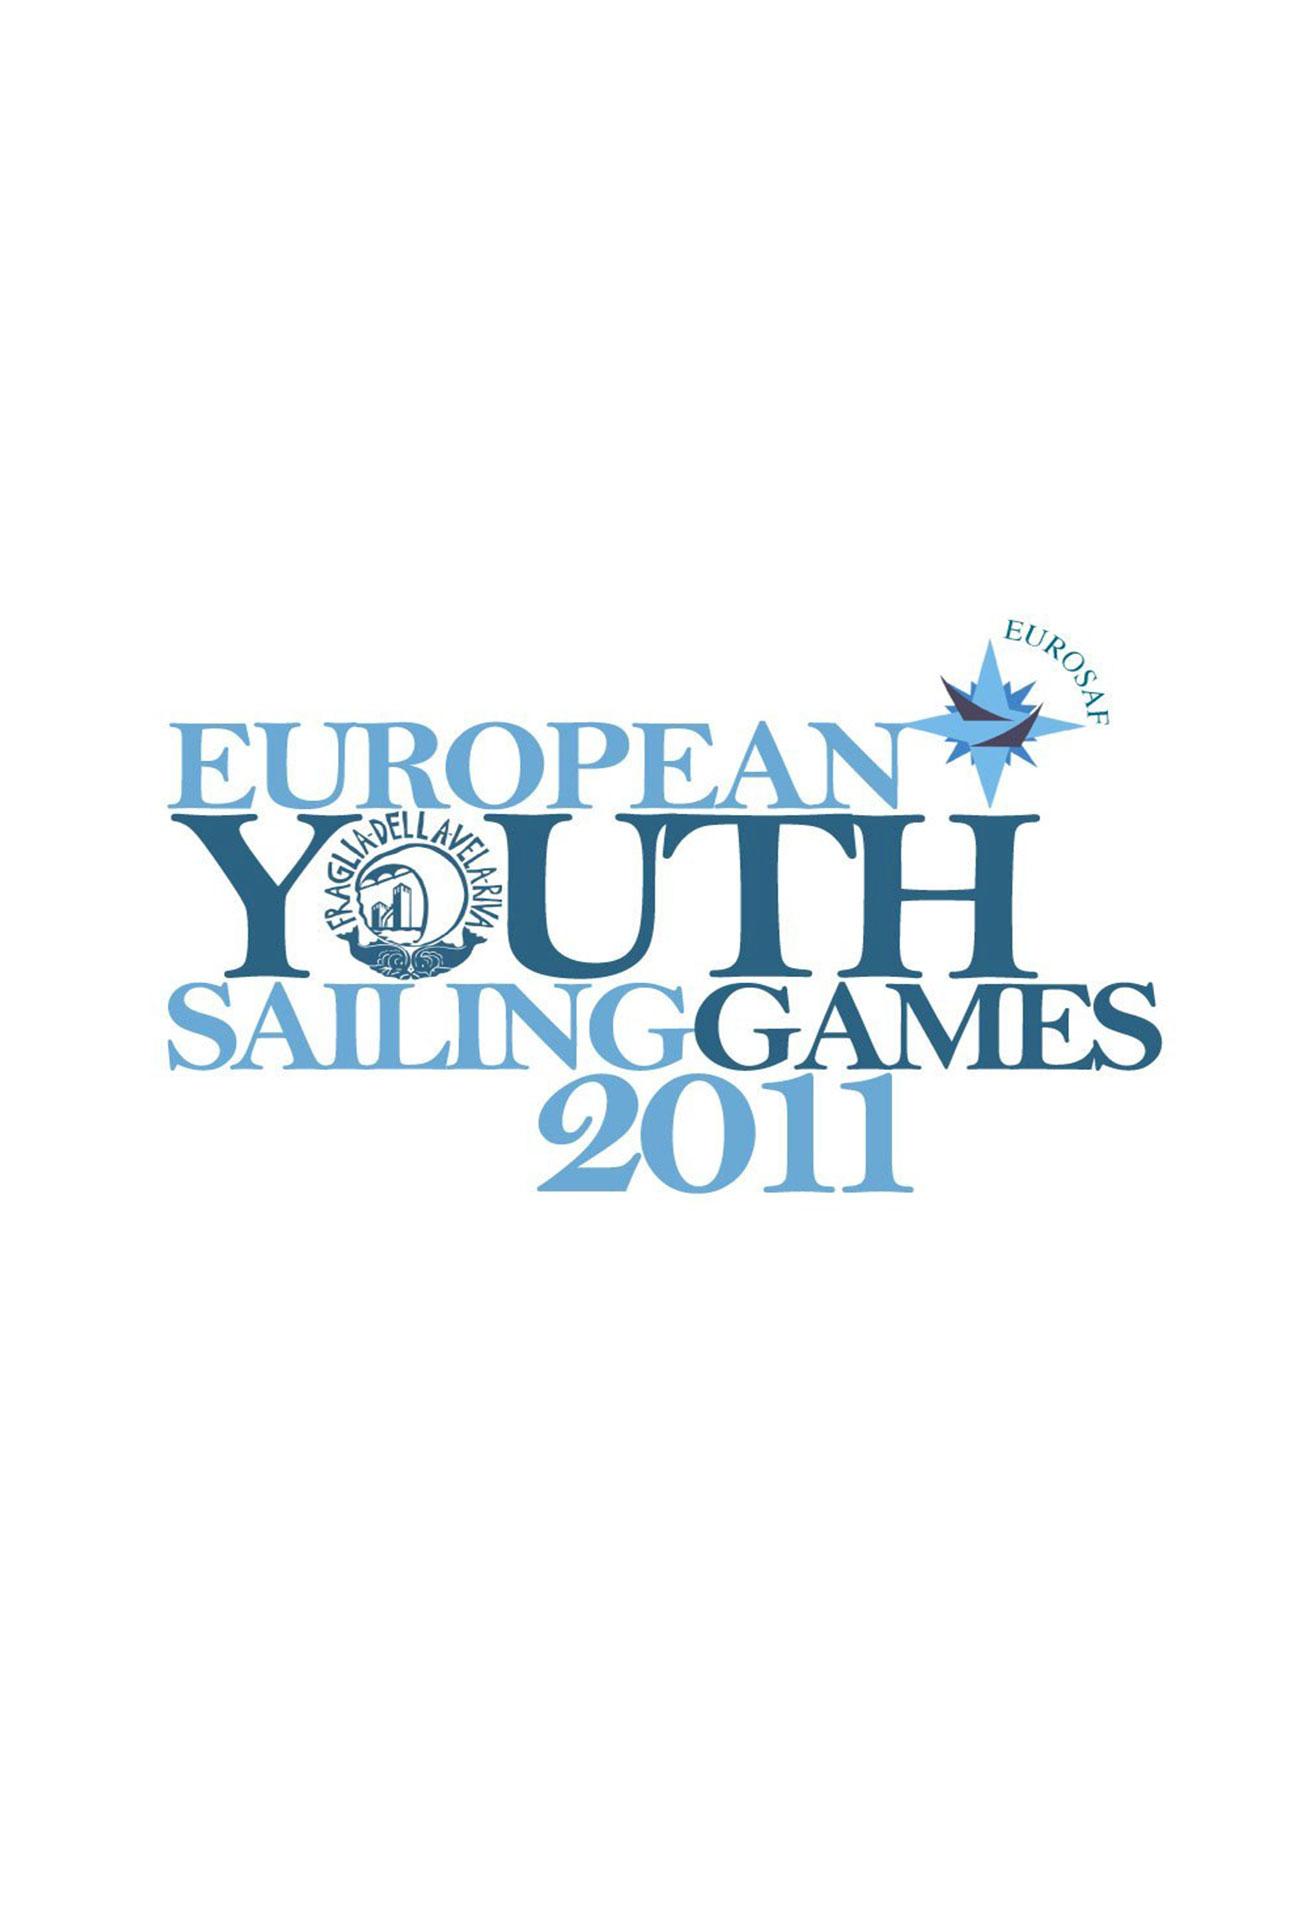 europeanyouthsailinggames2011_fvriva_giolai_po